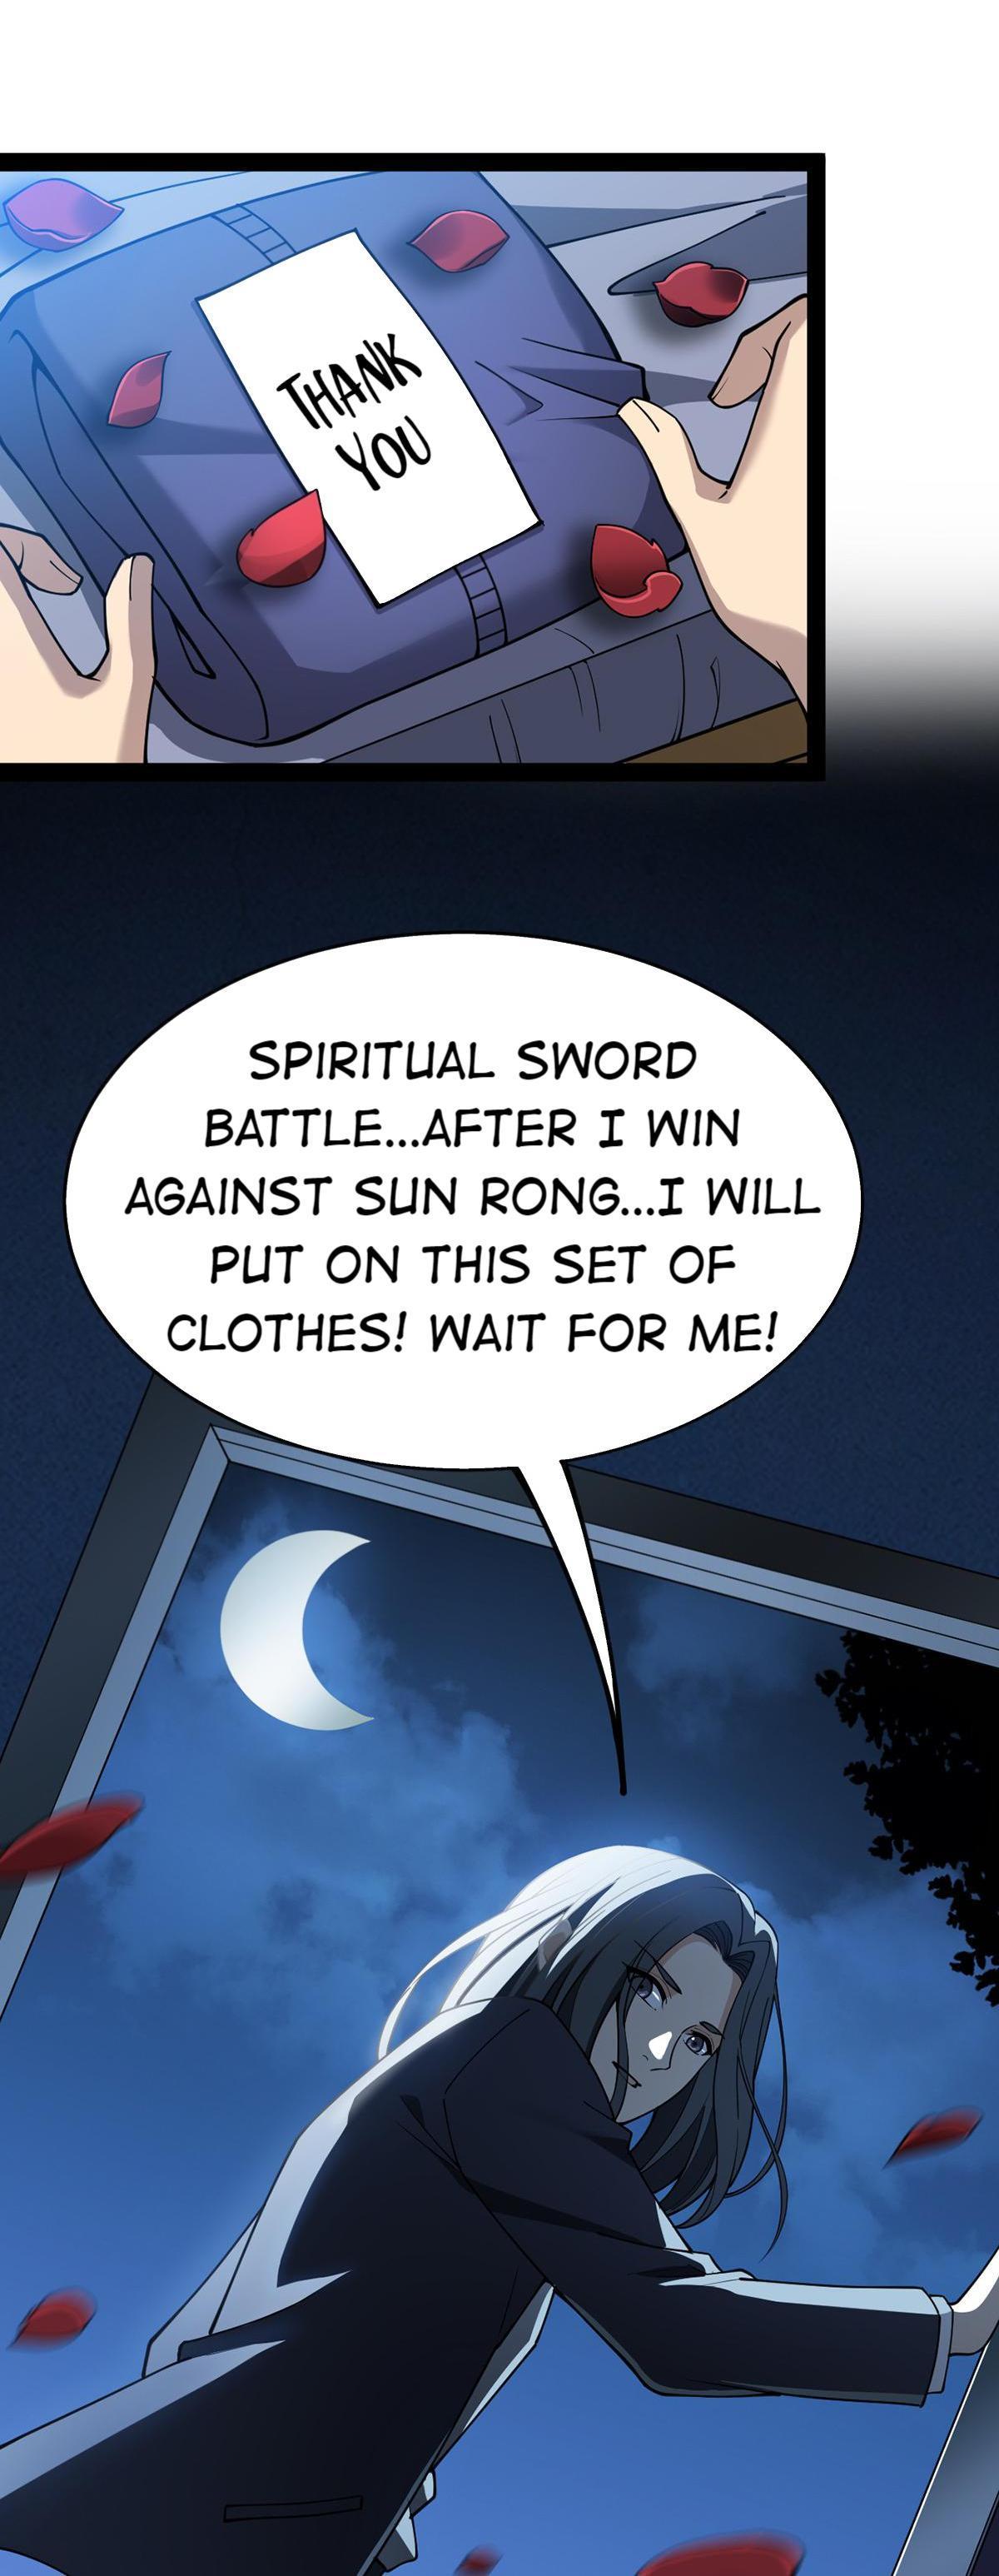 The Daily Life Of Immortal King Chapter 39: I'll Get My Men Now page 36 - Mangakakalots.com